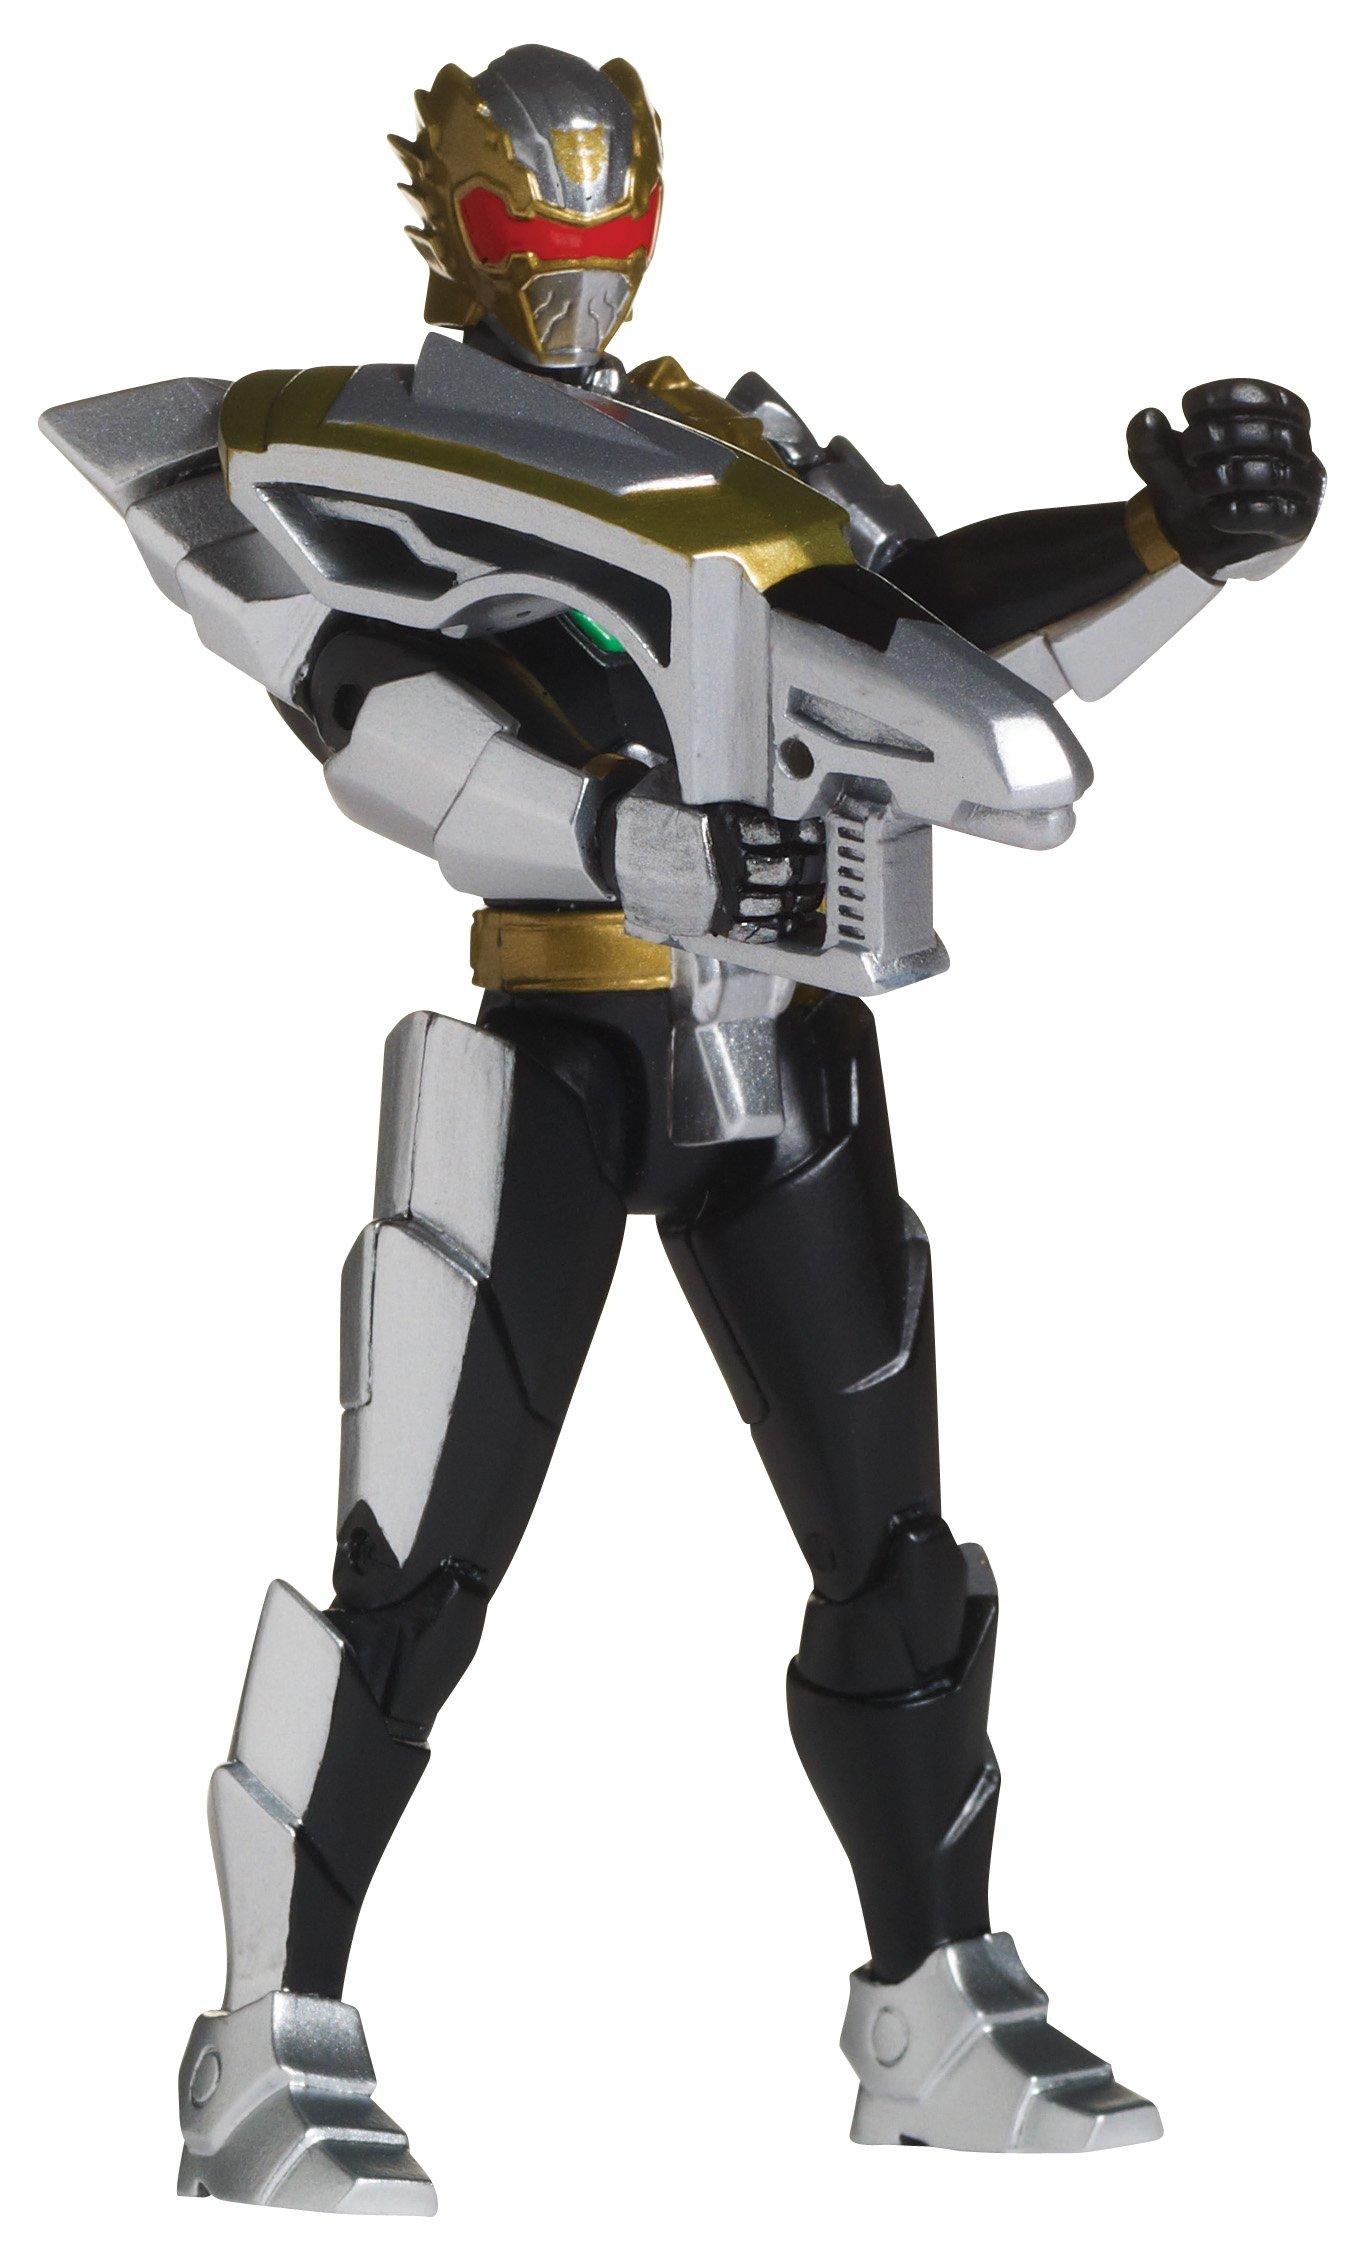 Power Rangers Megaforce Action Figure Robo Knight Power Ranger 4 Inch 4